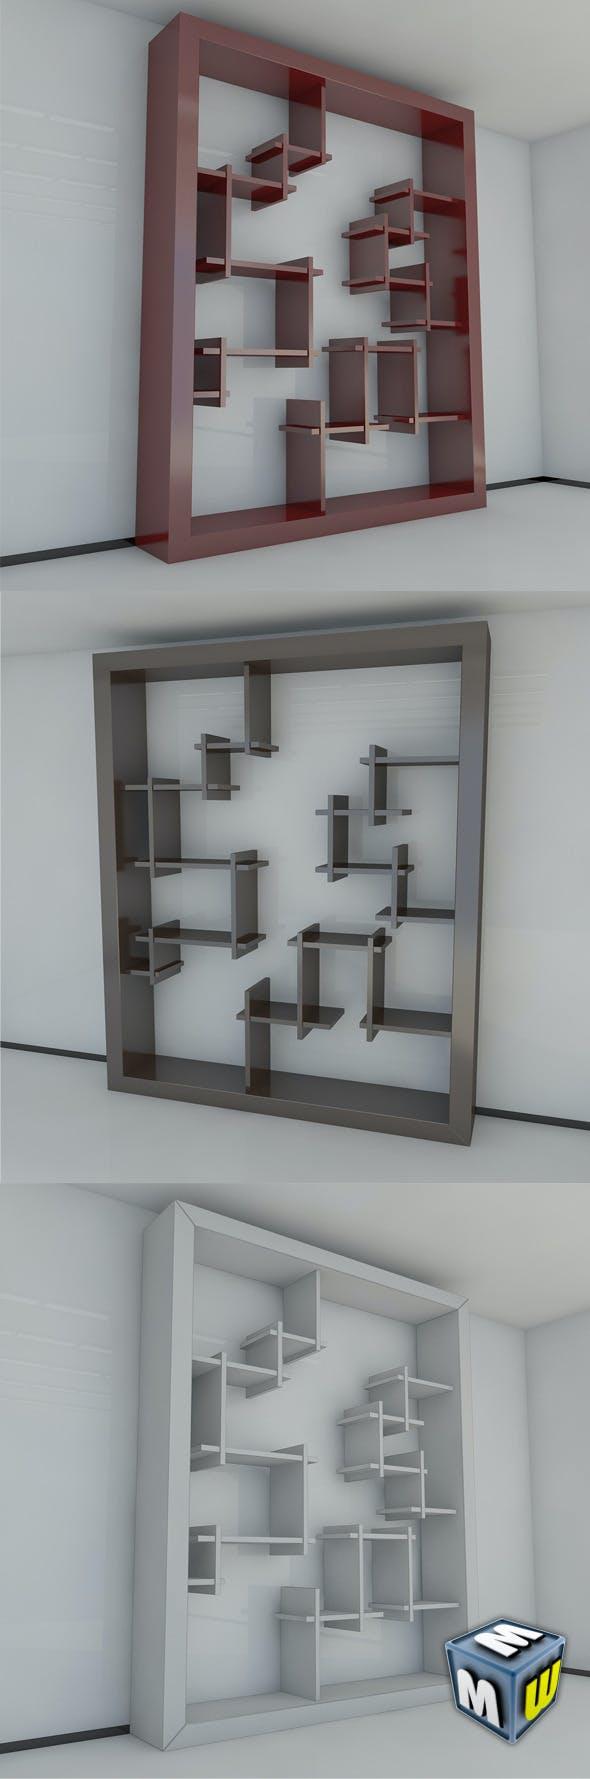 Bookshelf 7 MAX 2011 - 3DOcean Item for Sale